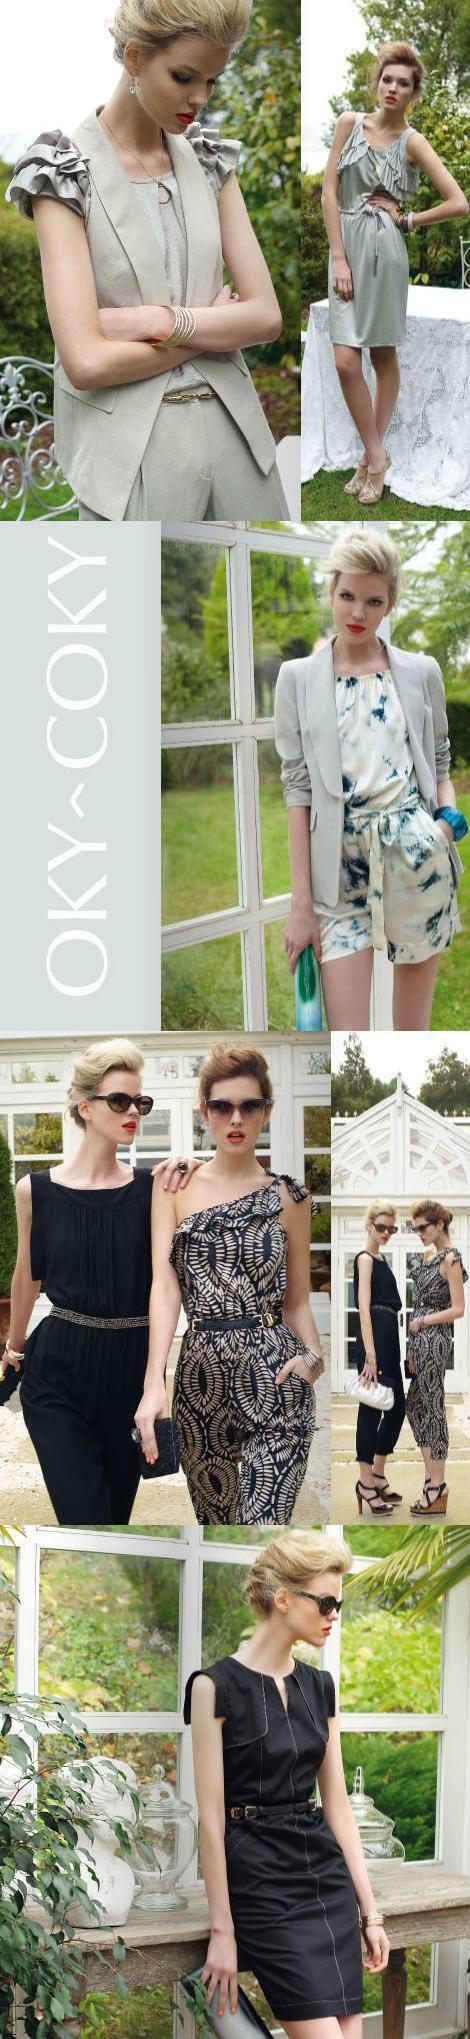 Oky Coky catálogo primavera verano 2011